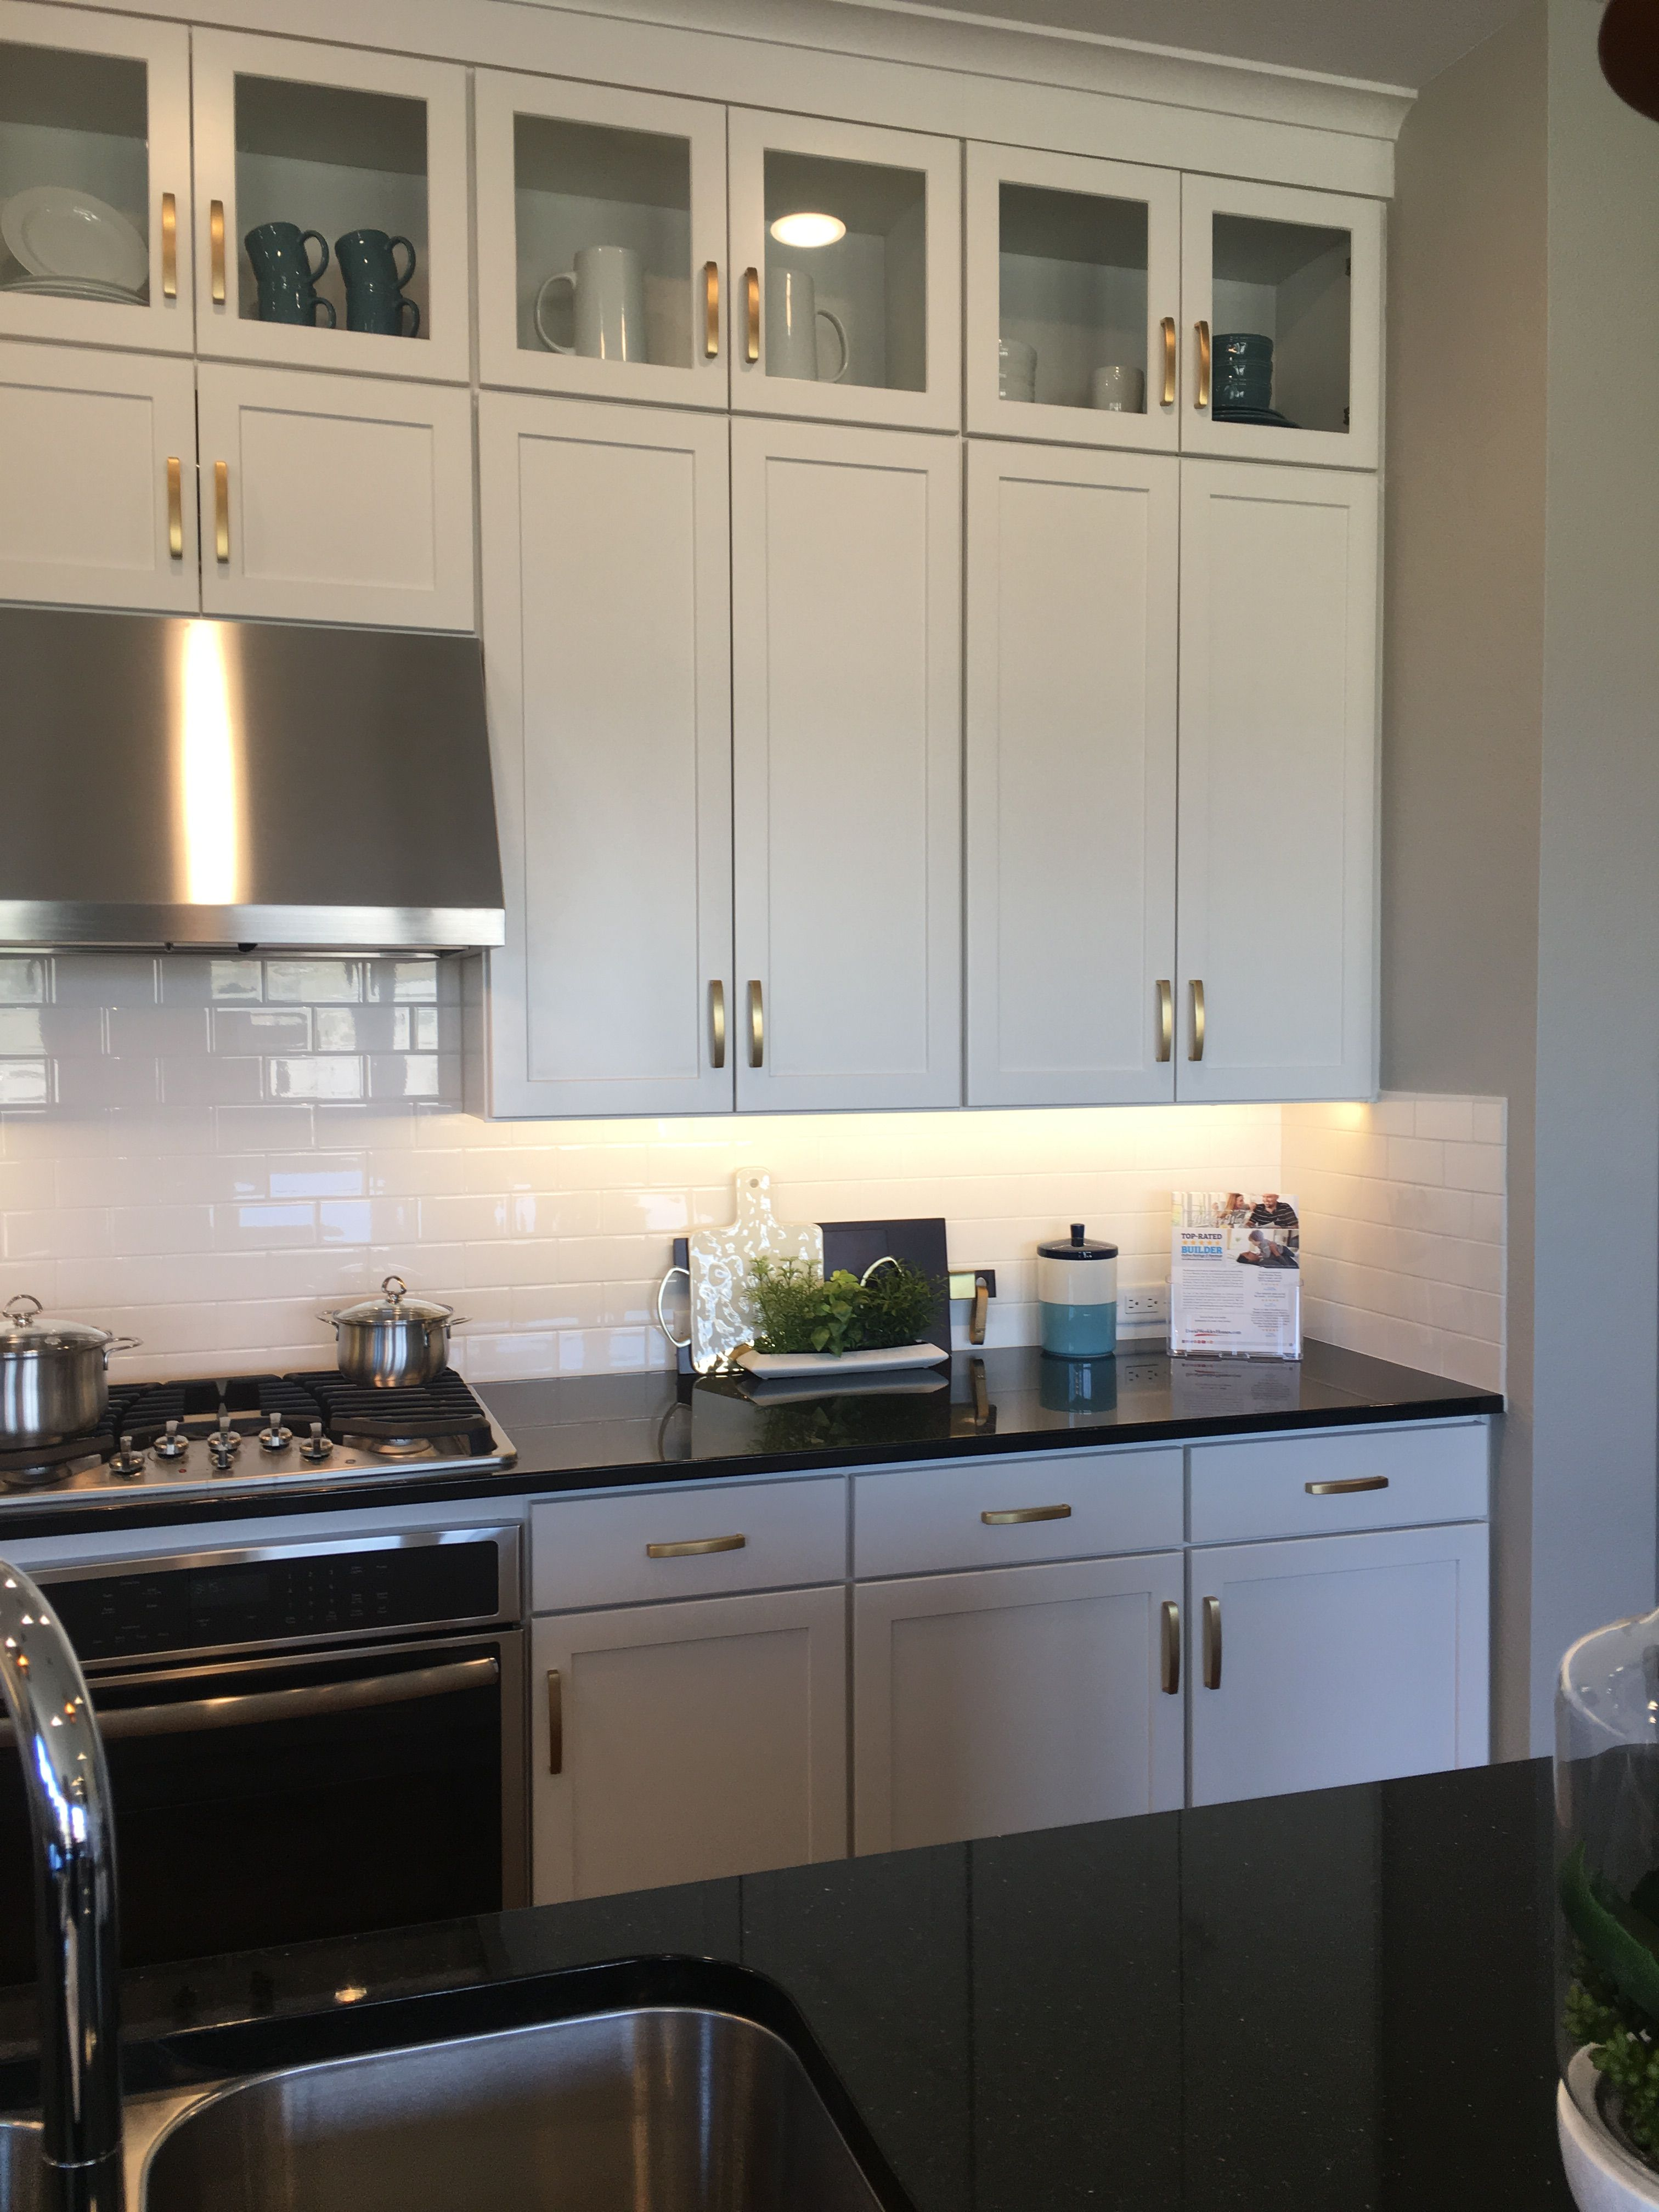 Pin by Brittney Allen on Home: Kitchen | Full overlay ...